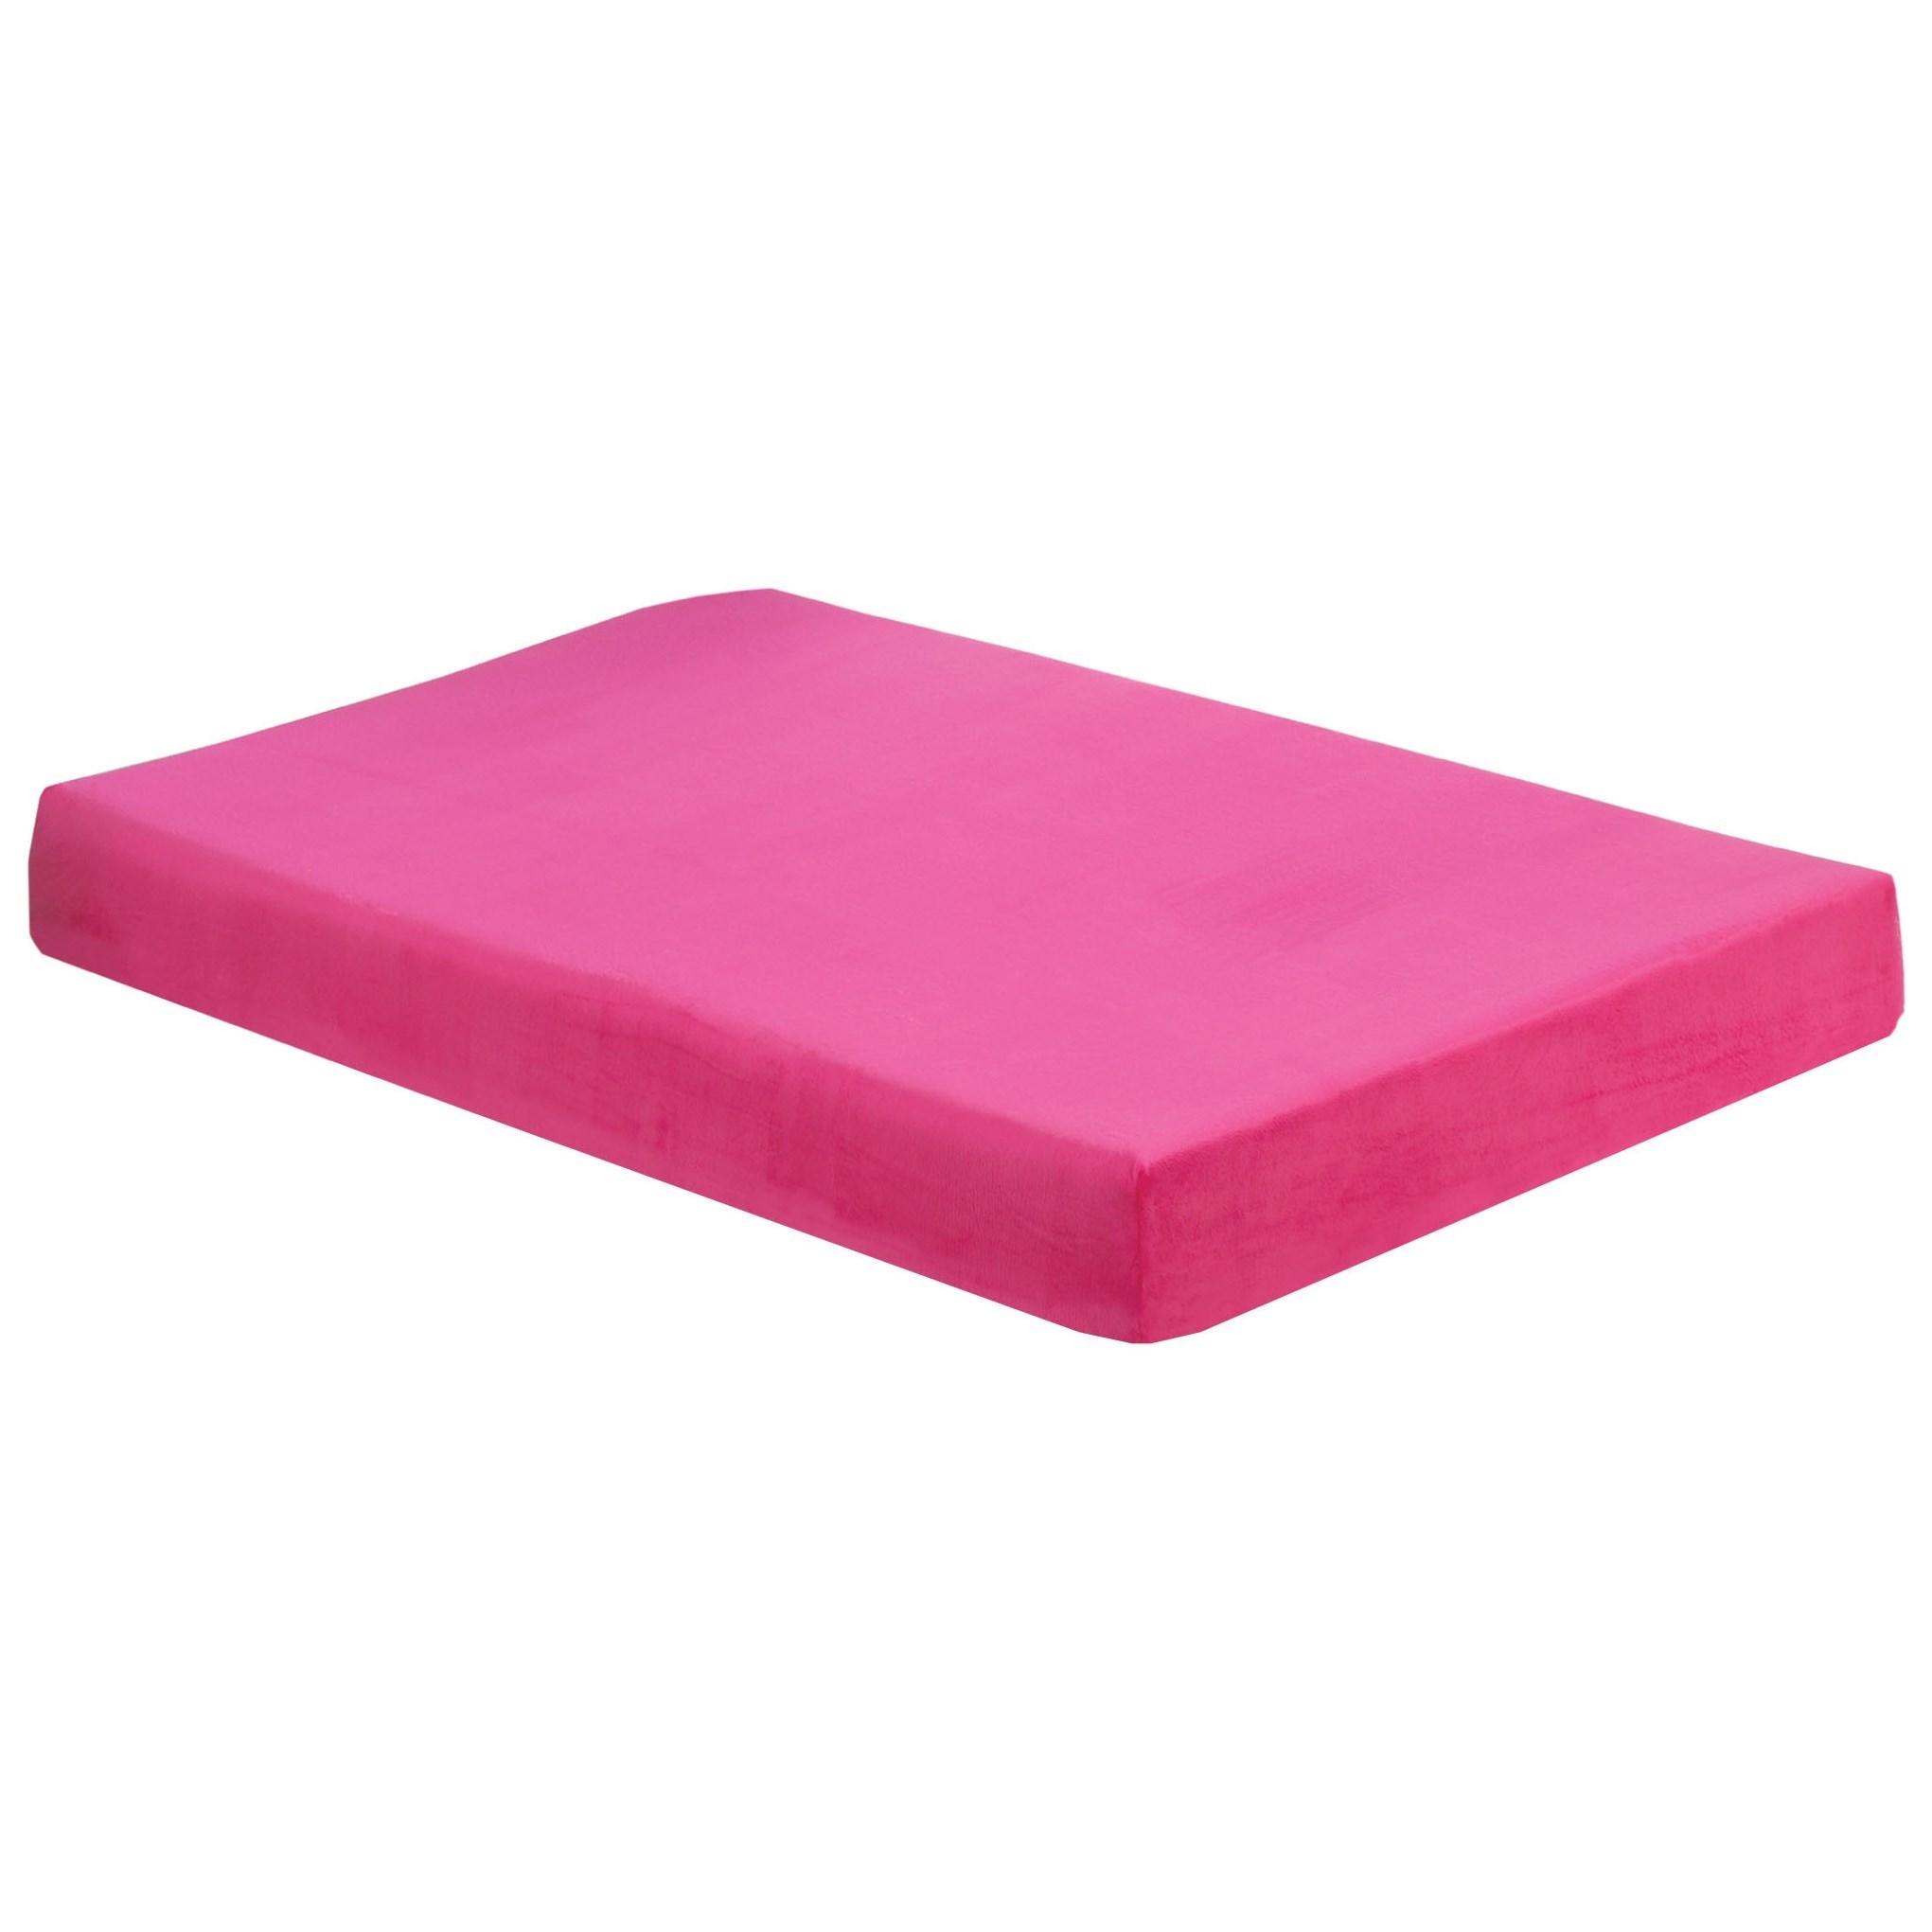 "1211 Visco Kids Full 7"" Raspberry Memory Foam Mattress by Boyd Specialty Sleep at Beds N Stuff"